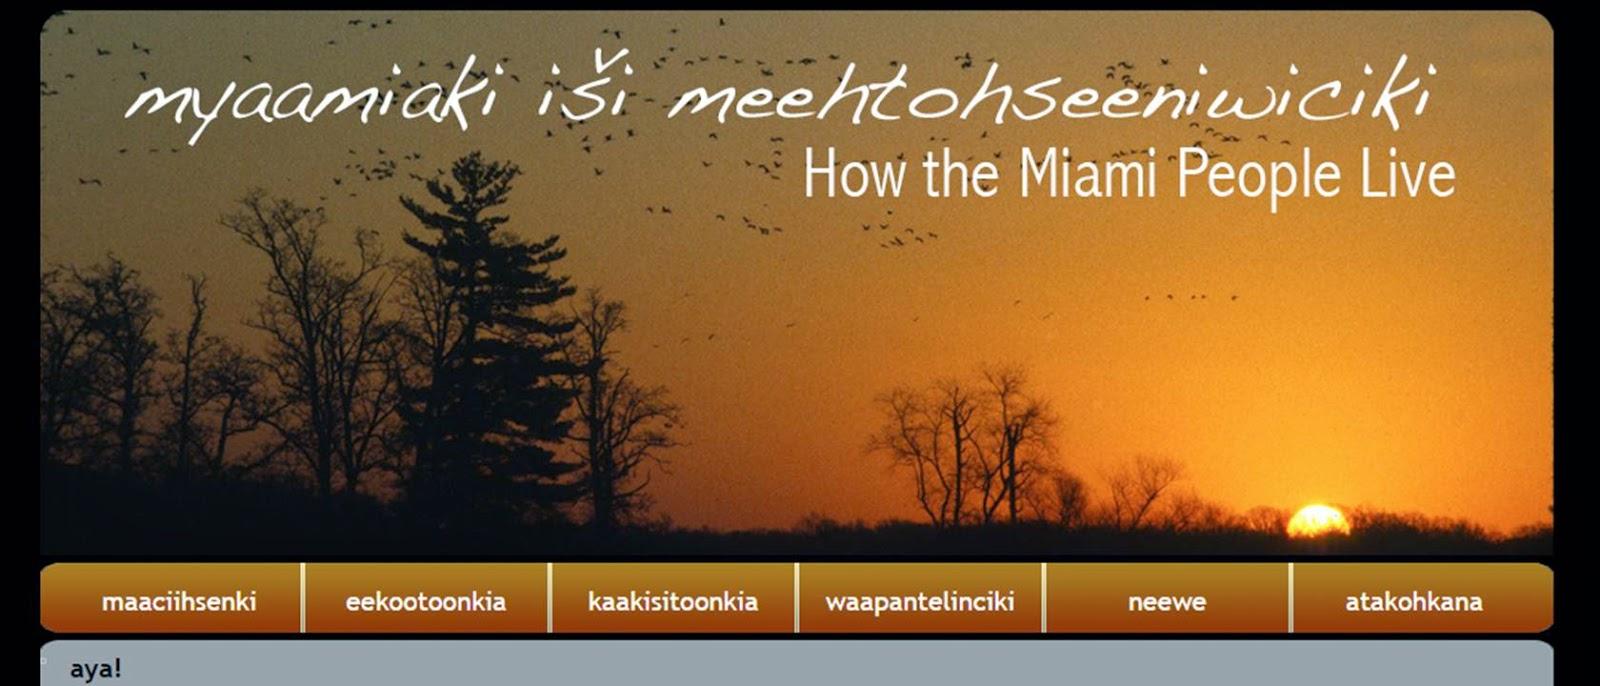 myaamiaki iši meehtohseeniwiciki: How the Miami People Live